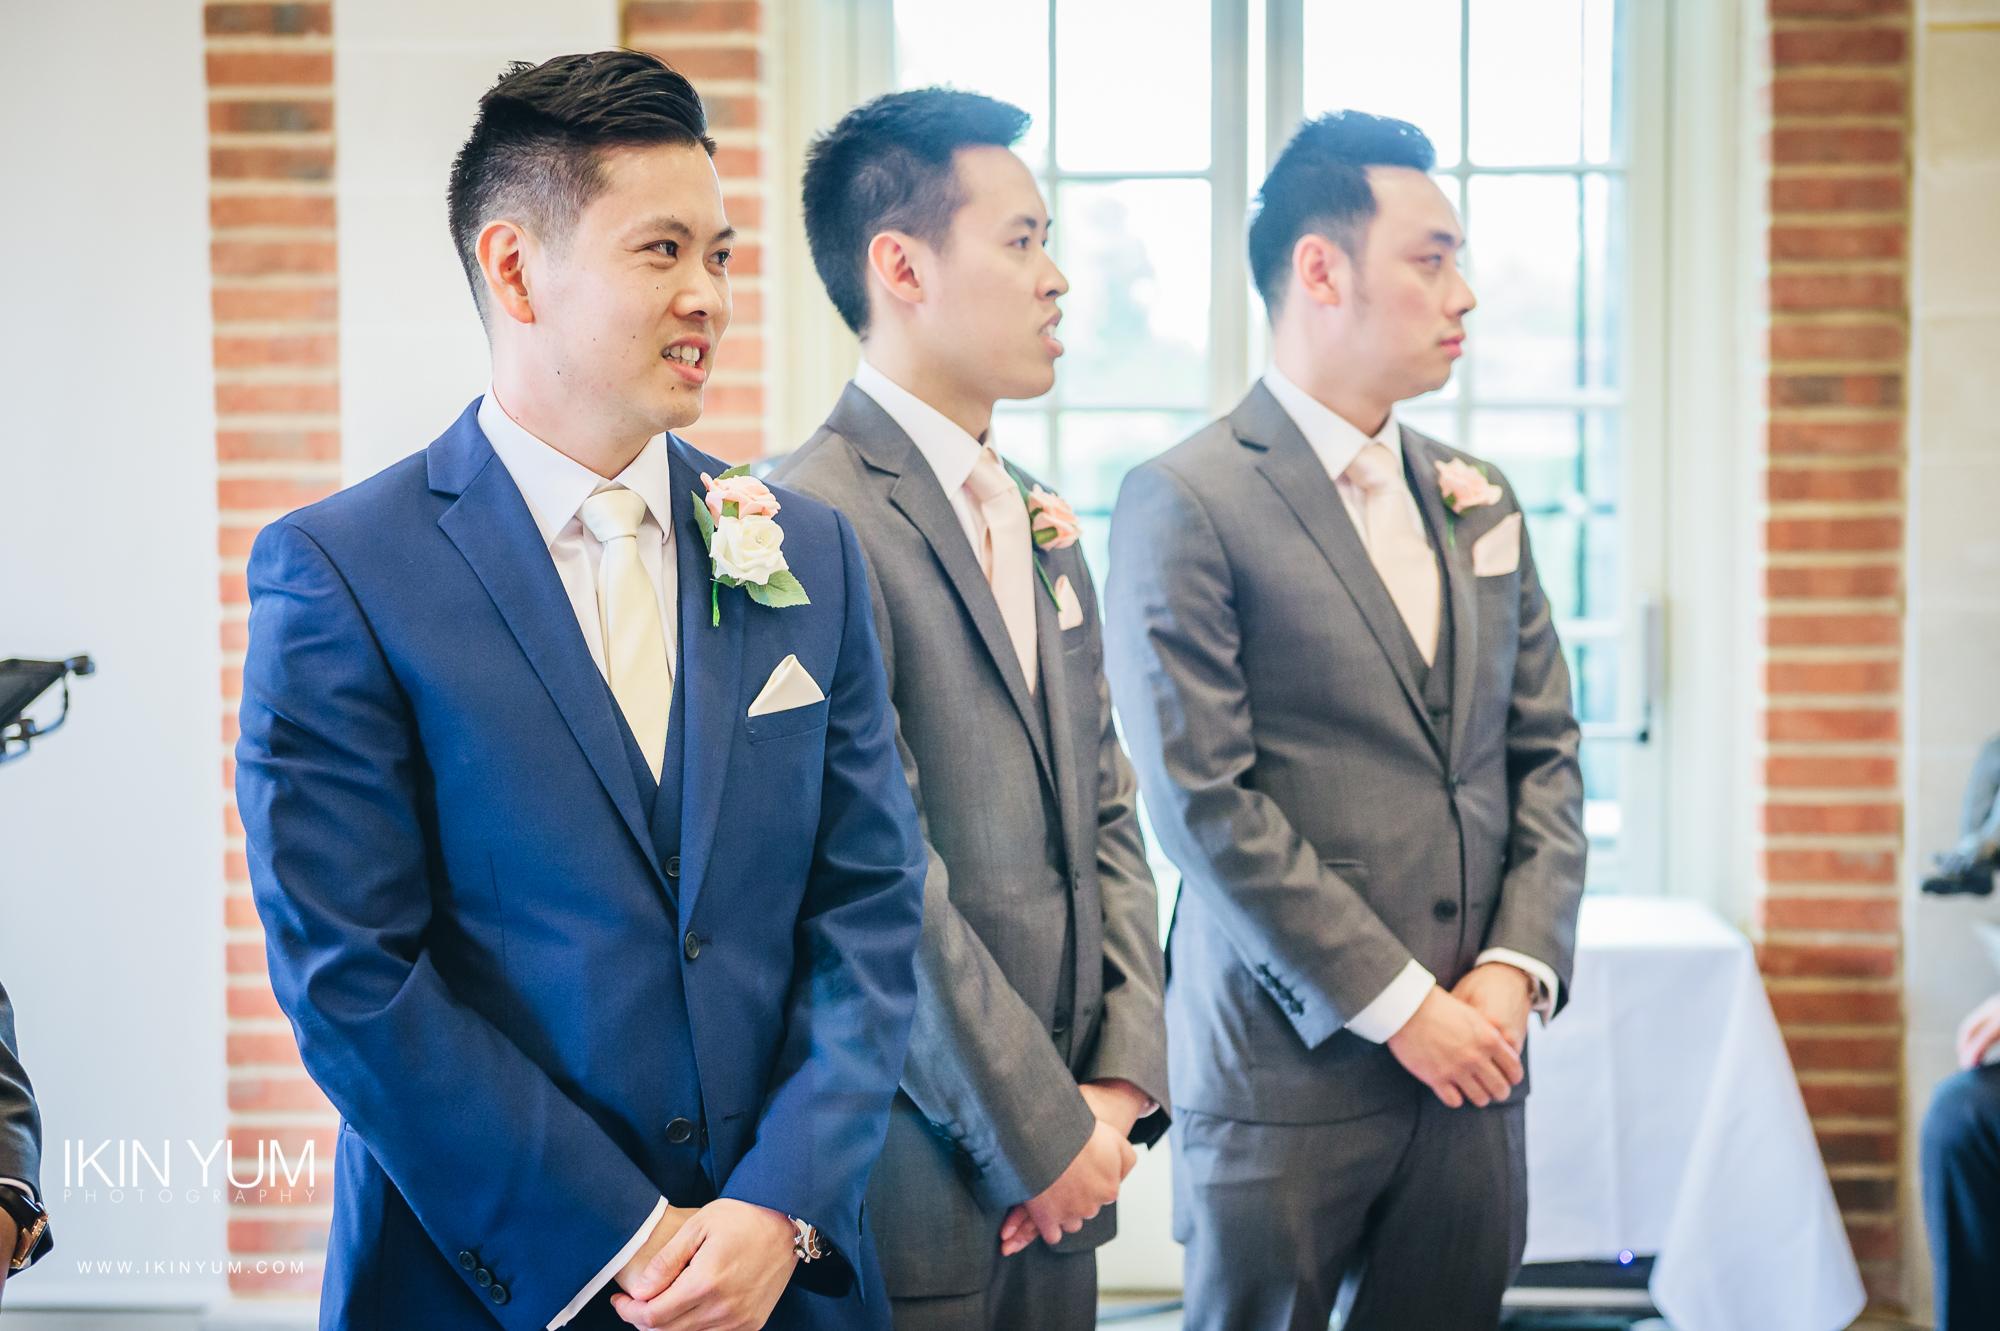 Great Foster Wedding - Ikin Yum Photography-096.jpg